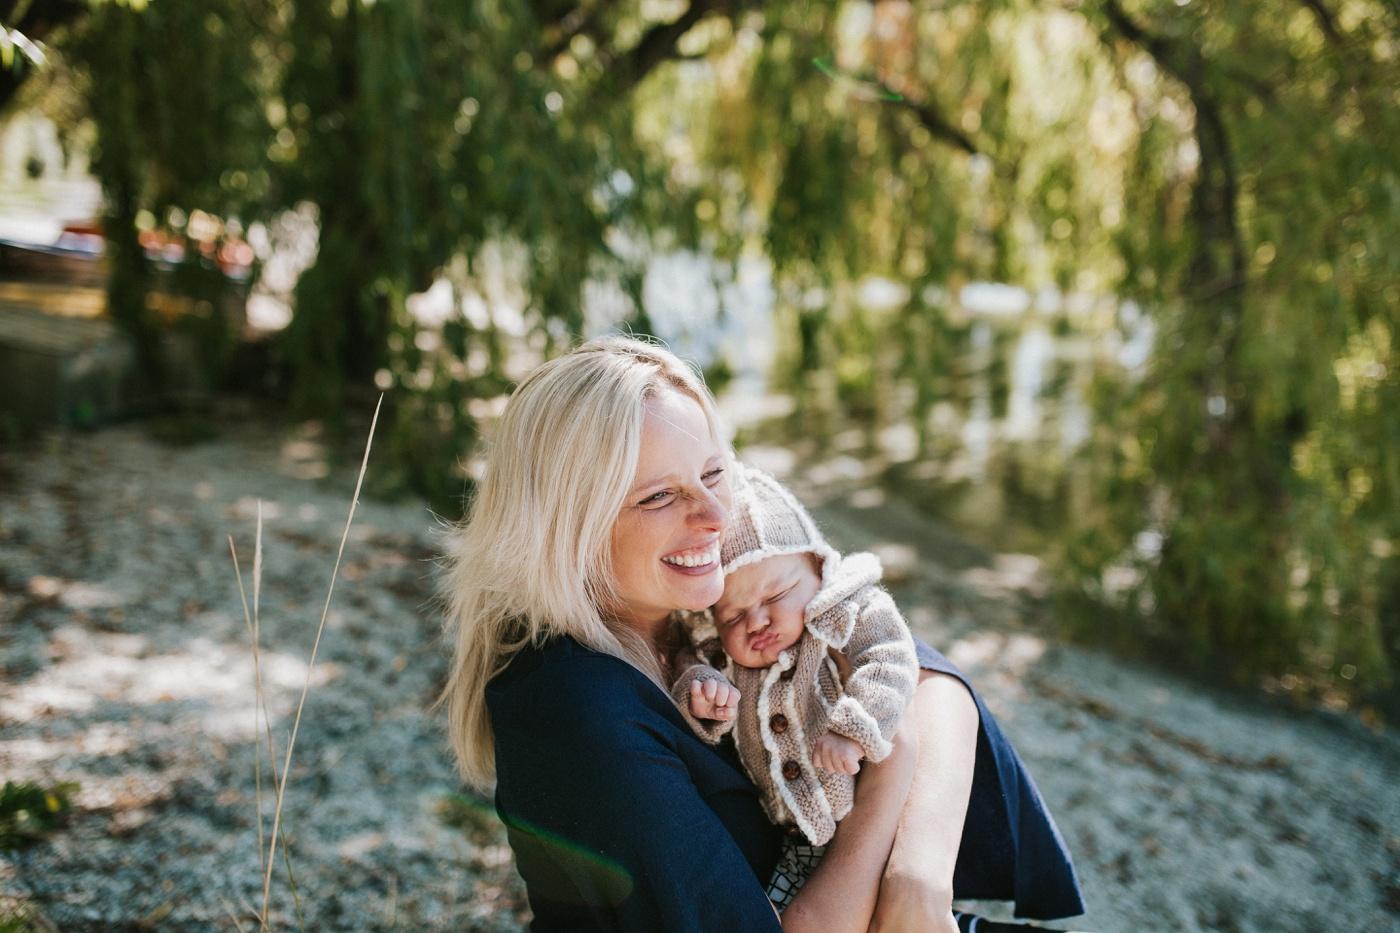 Blake-Lily-Rolig-Lekfull-Familjesession-Familjefotograf-Stockholm-Orebro_17